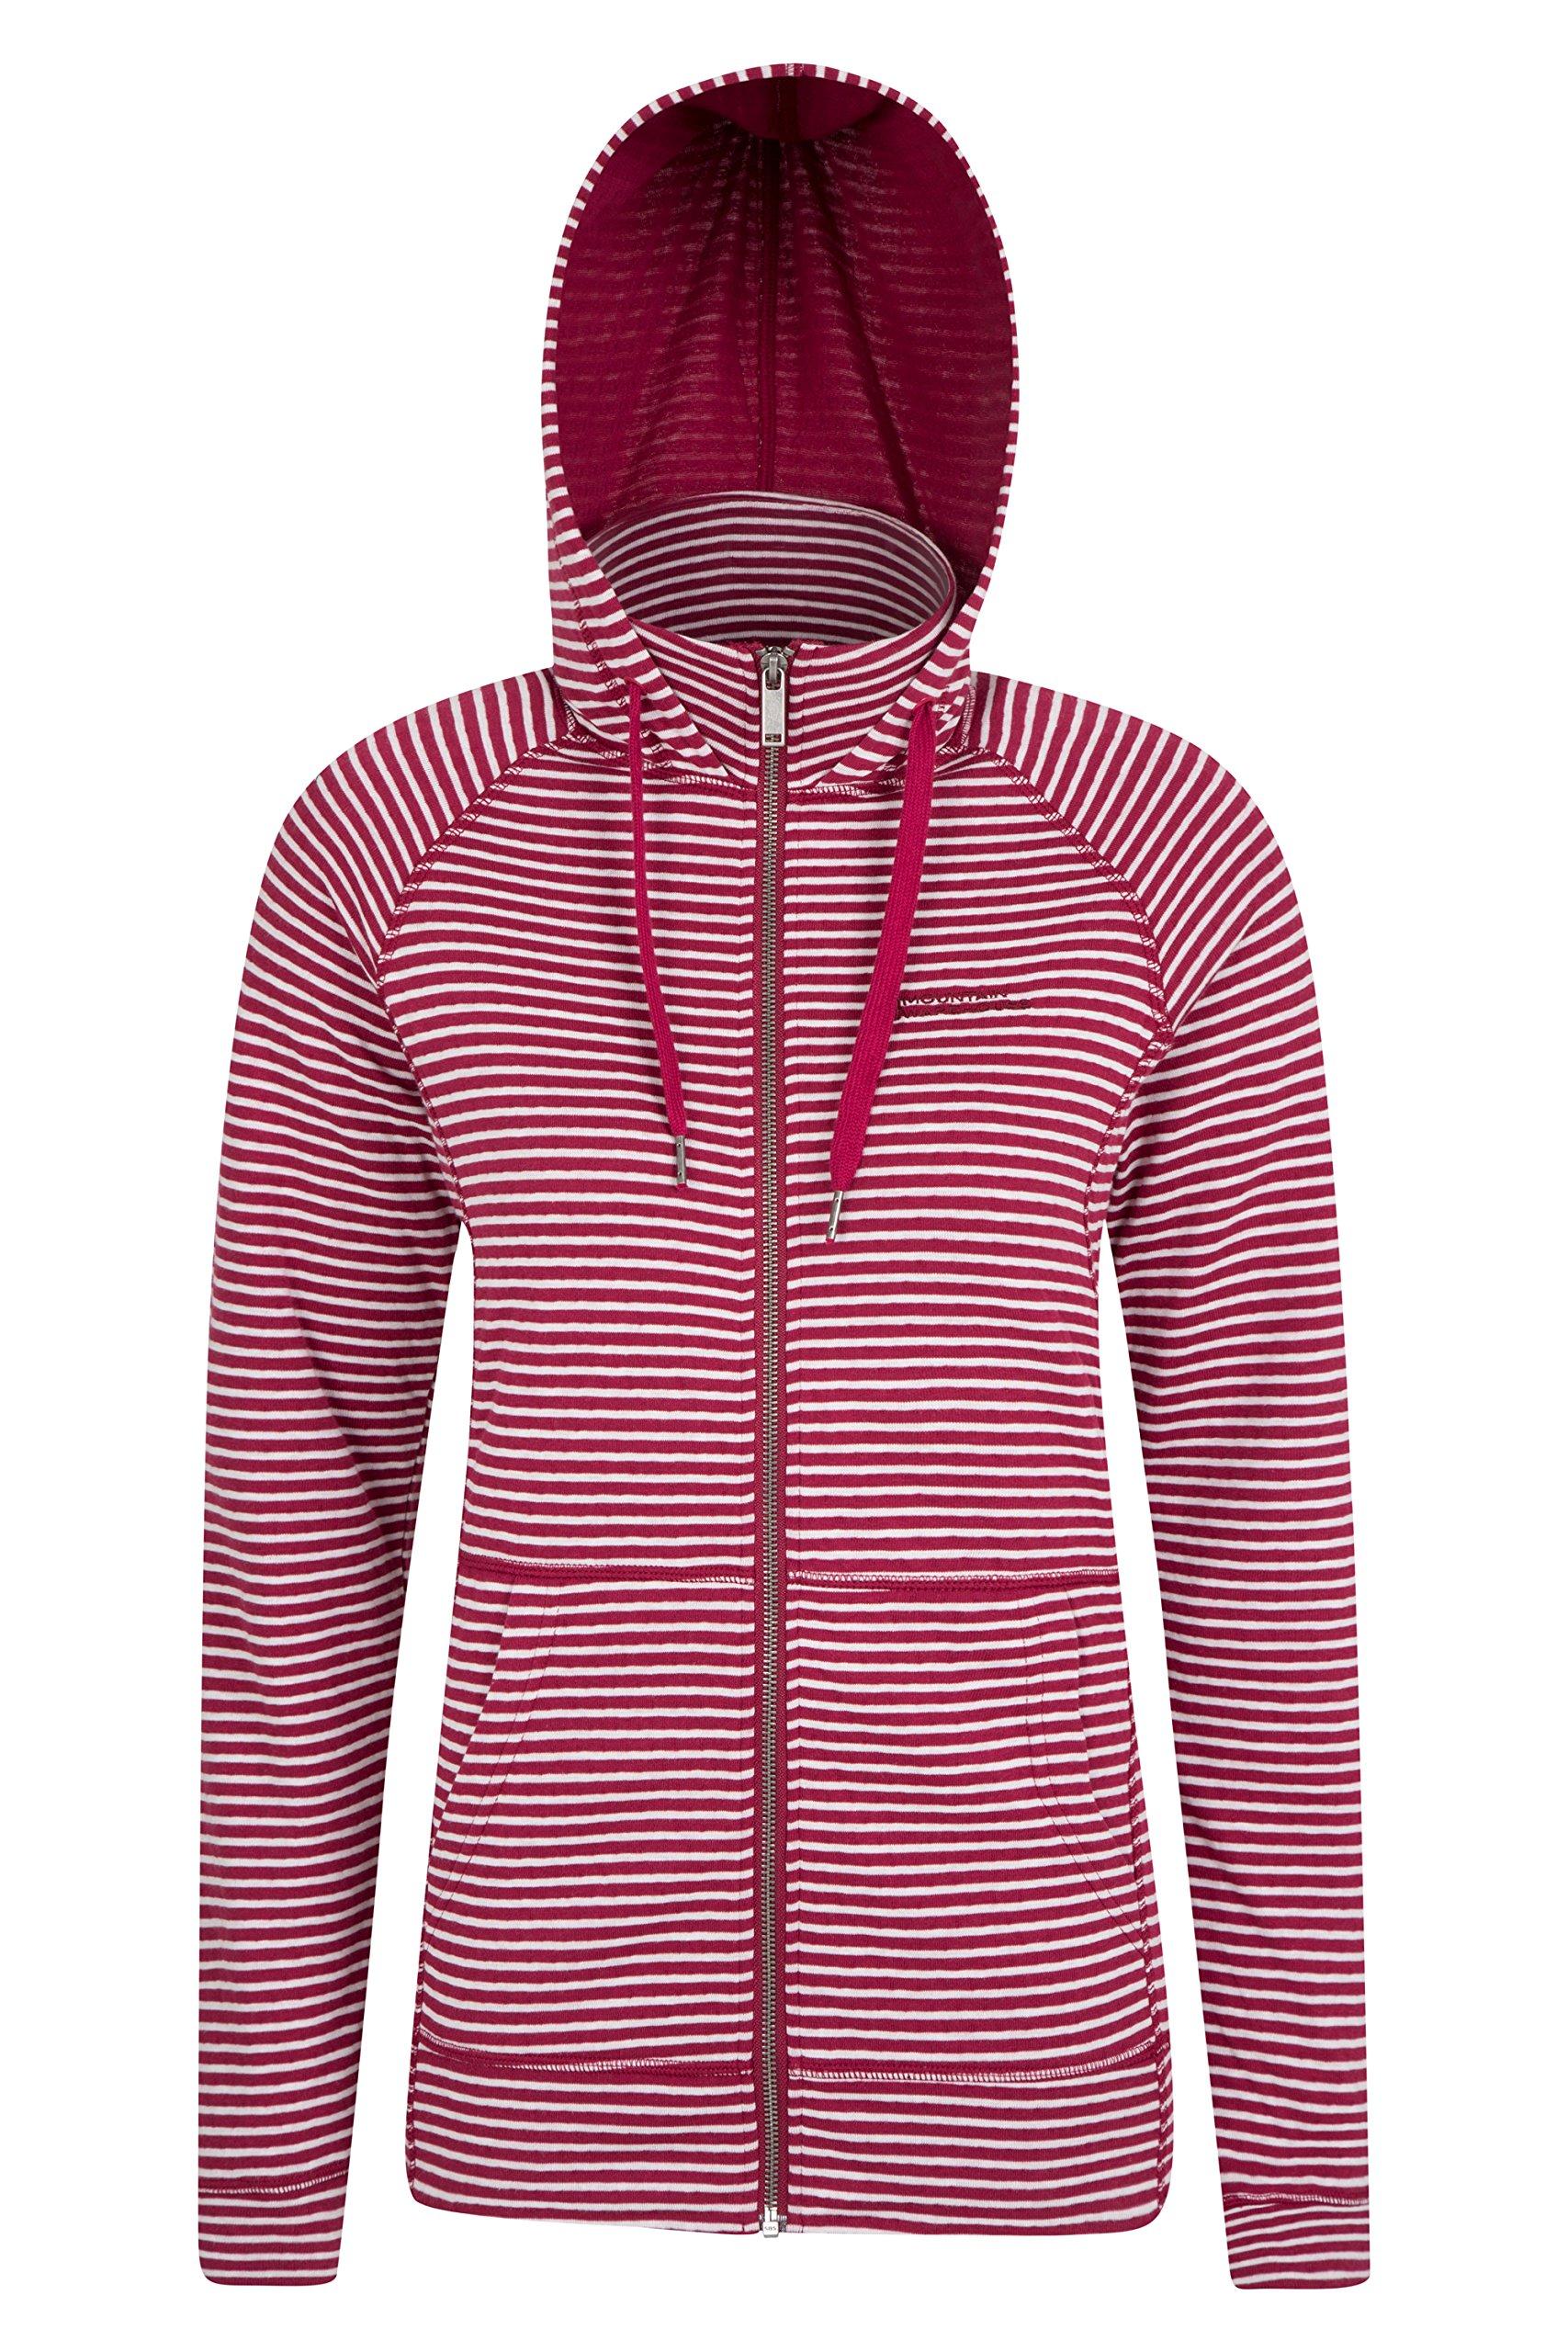 91bUu9fKTtL - Mountain Warehouse Woolamai Womens Full-Zip Hoodie -Antipill, High Neck Ladies Jacket, Breathable, Adjustable Hood, Easy…